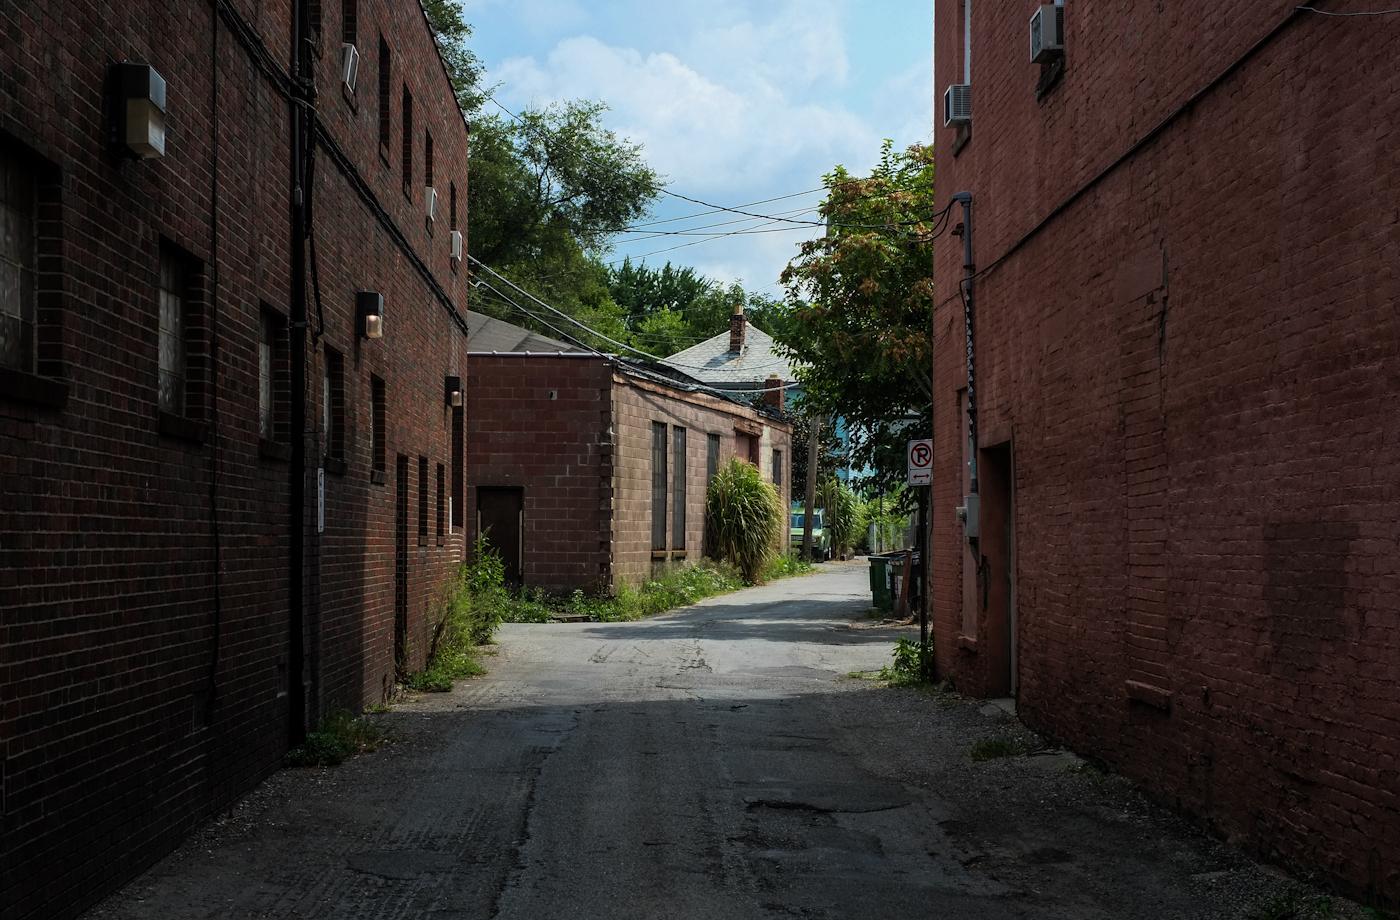 Columbus Alley